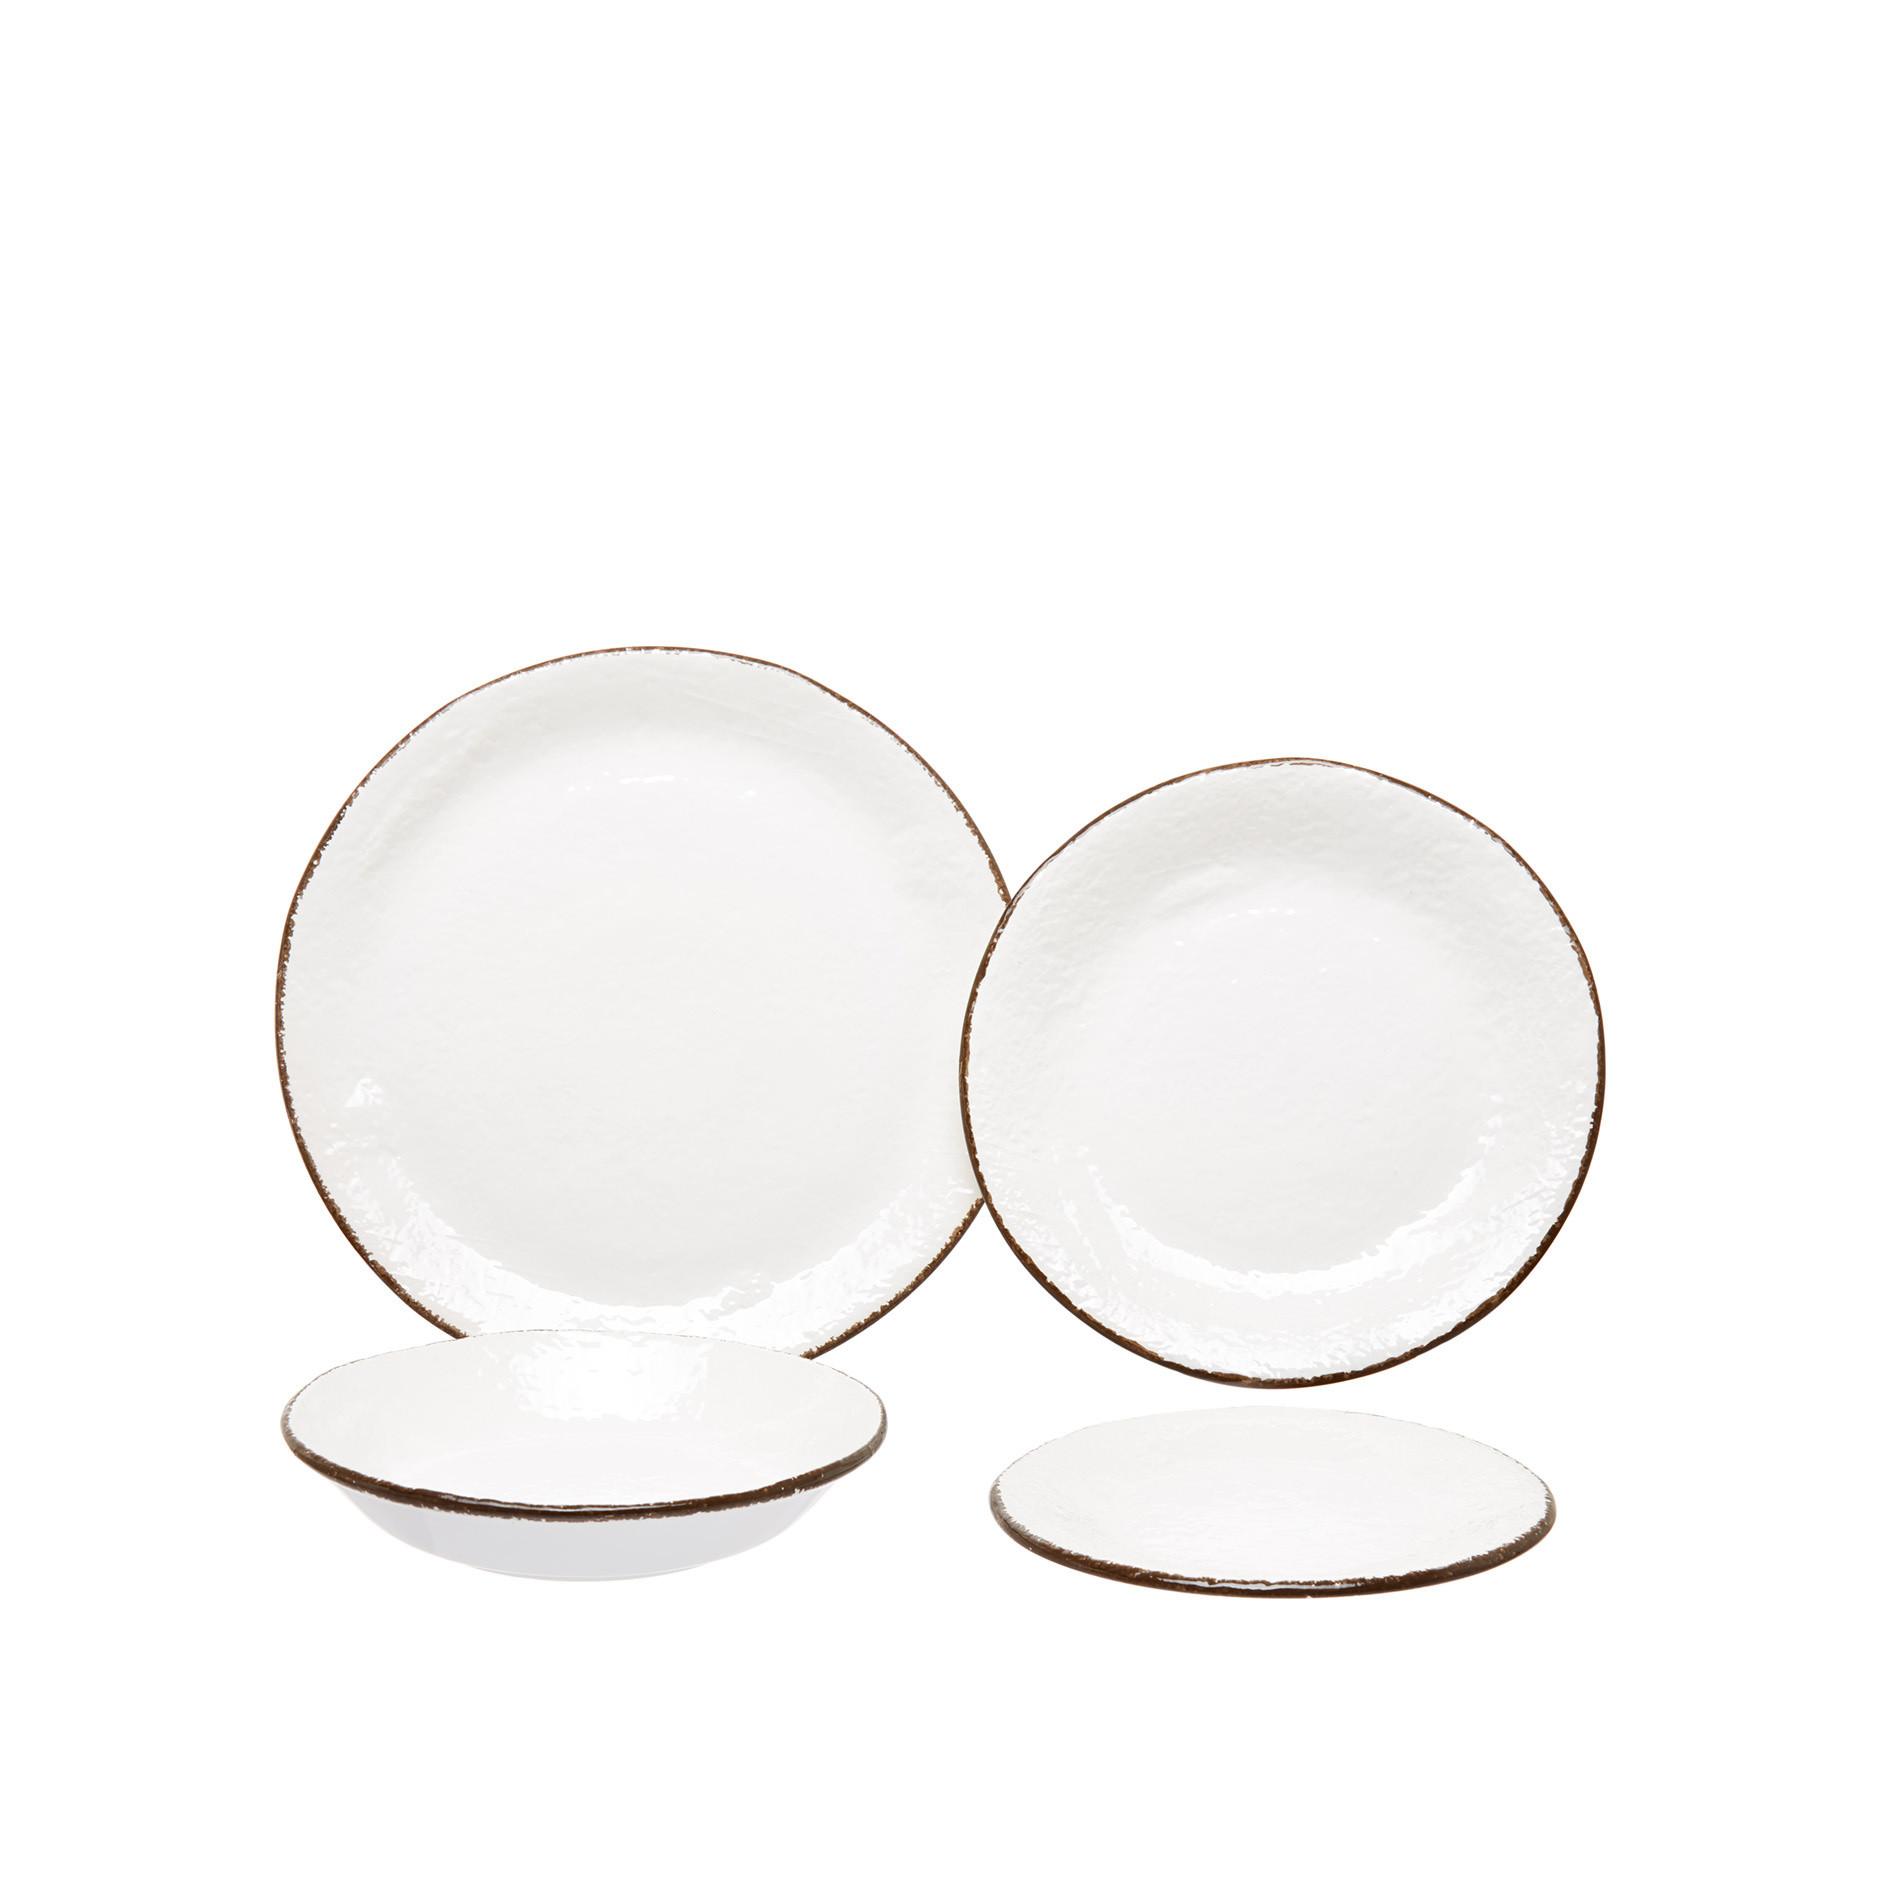 Piatto fondo ceramica artigianale Preta, Bianco, large image number 2